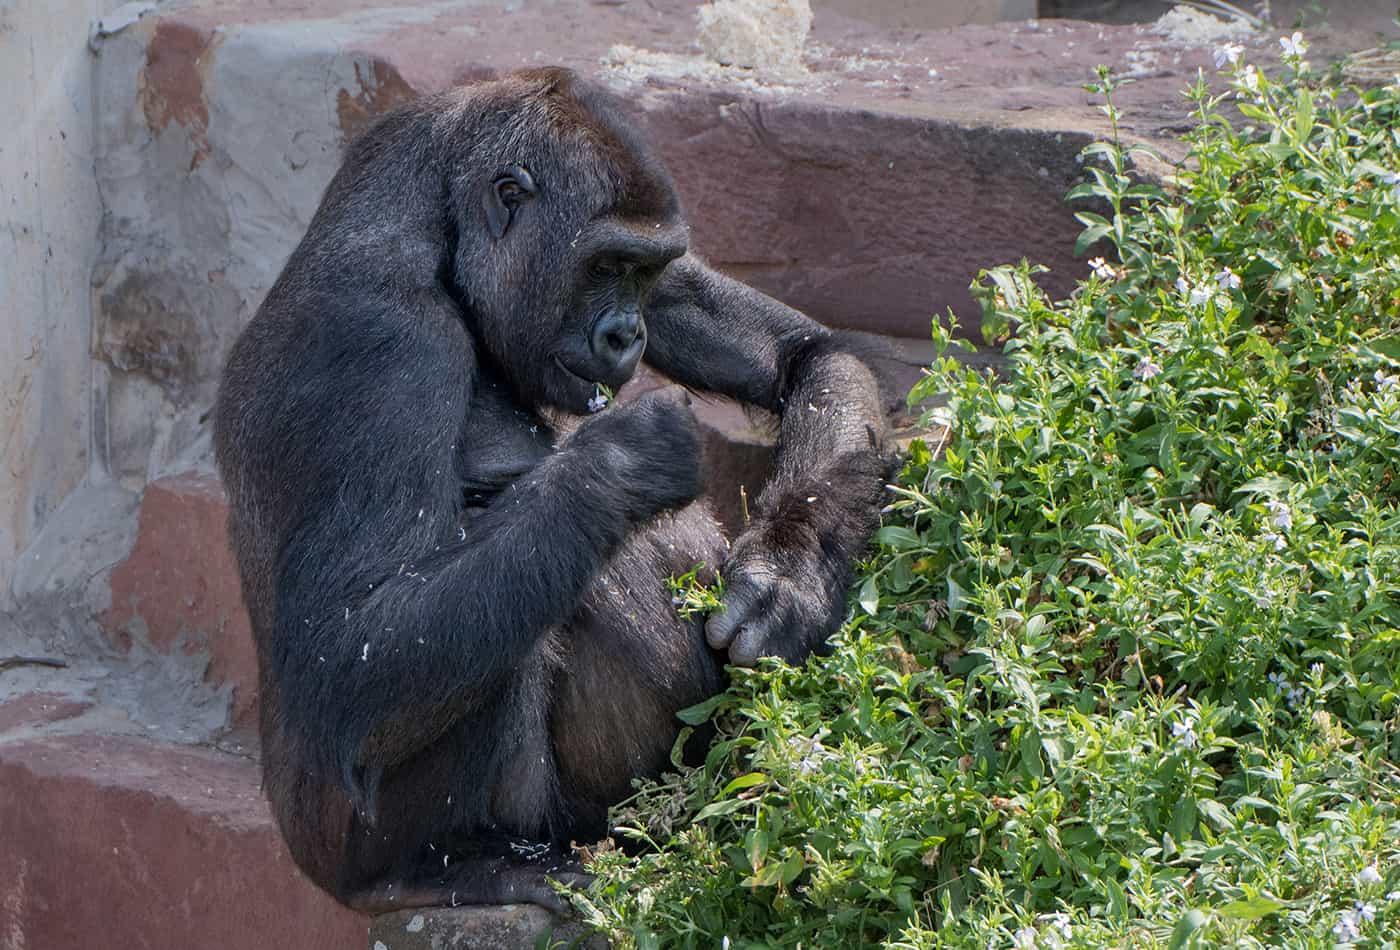 Gorillaweibchen Zsa Zsa im Zoo Heidelberg (Foto: Zoo Heidelberg)